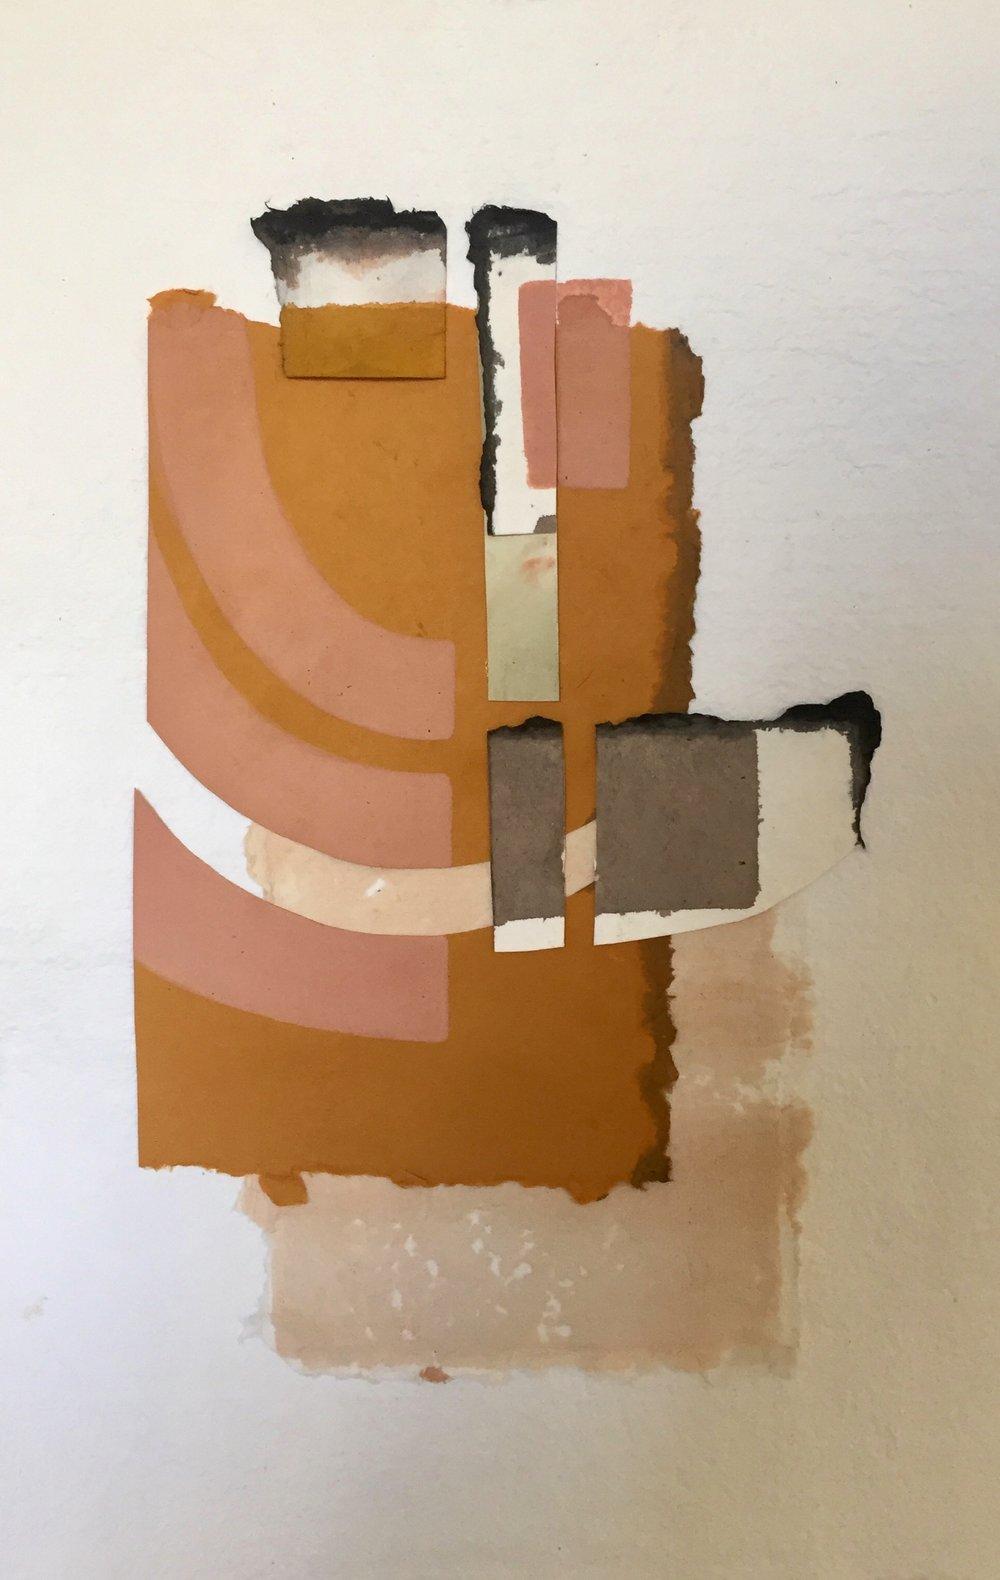 18 x 12 | 'Warm City' on deckled edge paper, custom framed | available